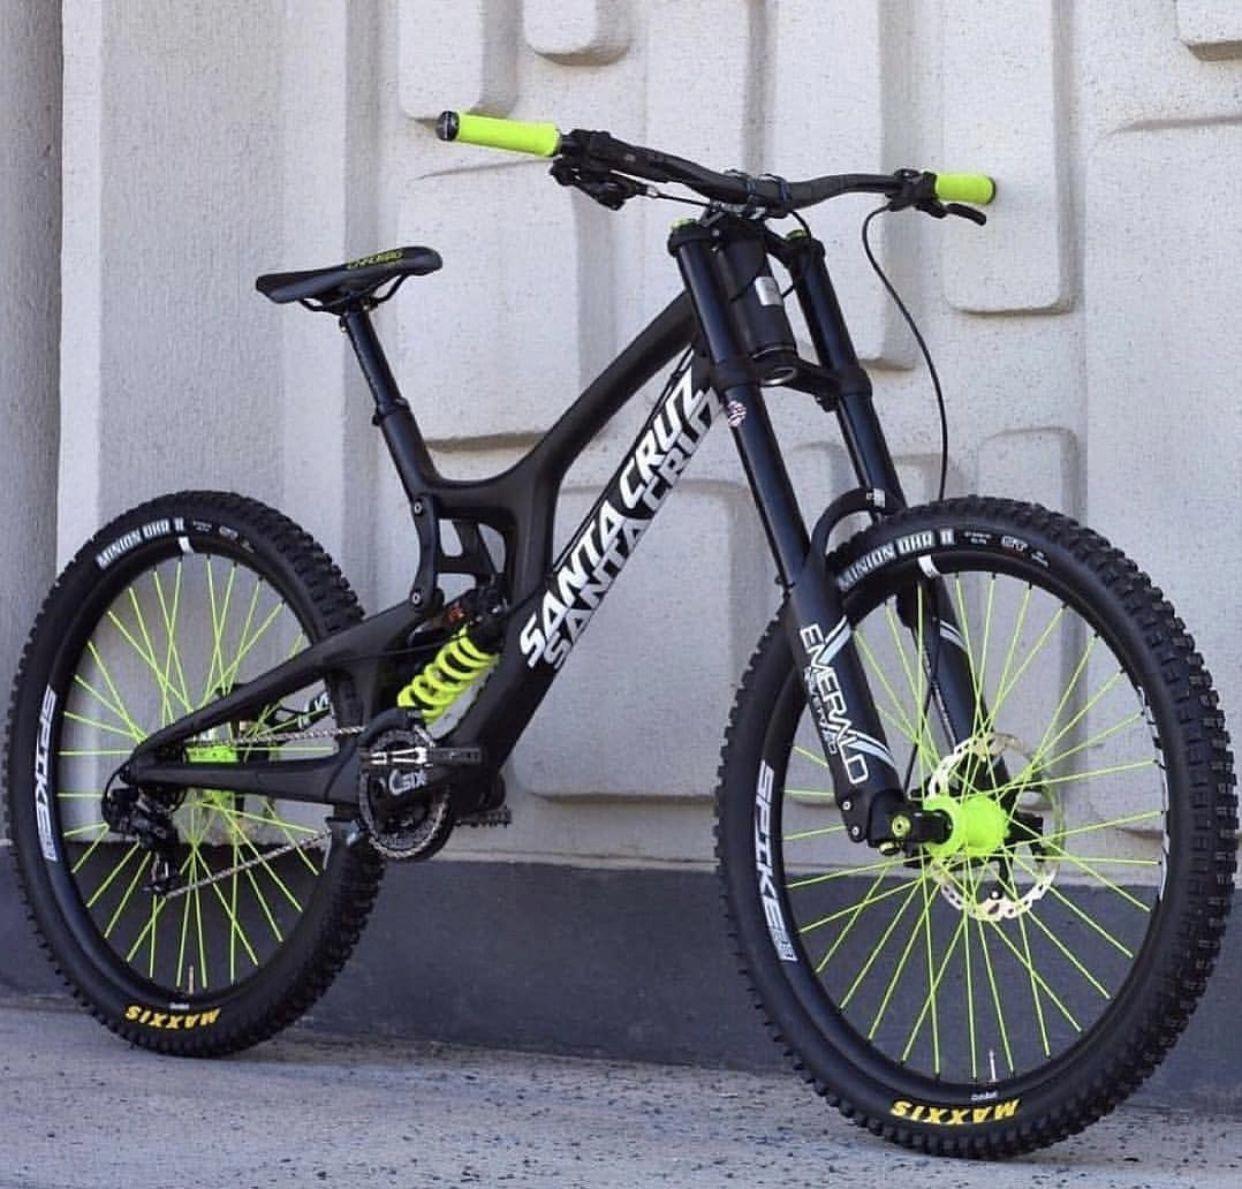 Types Of Bikes In 2020 Mtb Bike Mountain Bicycle Mountain Bike